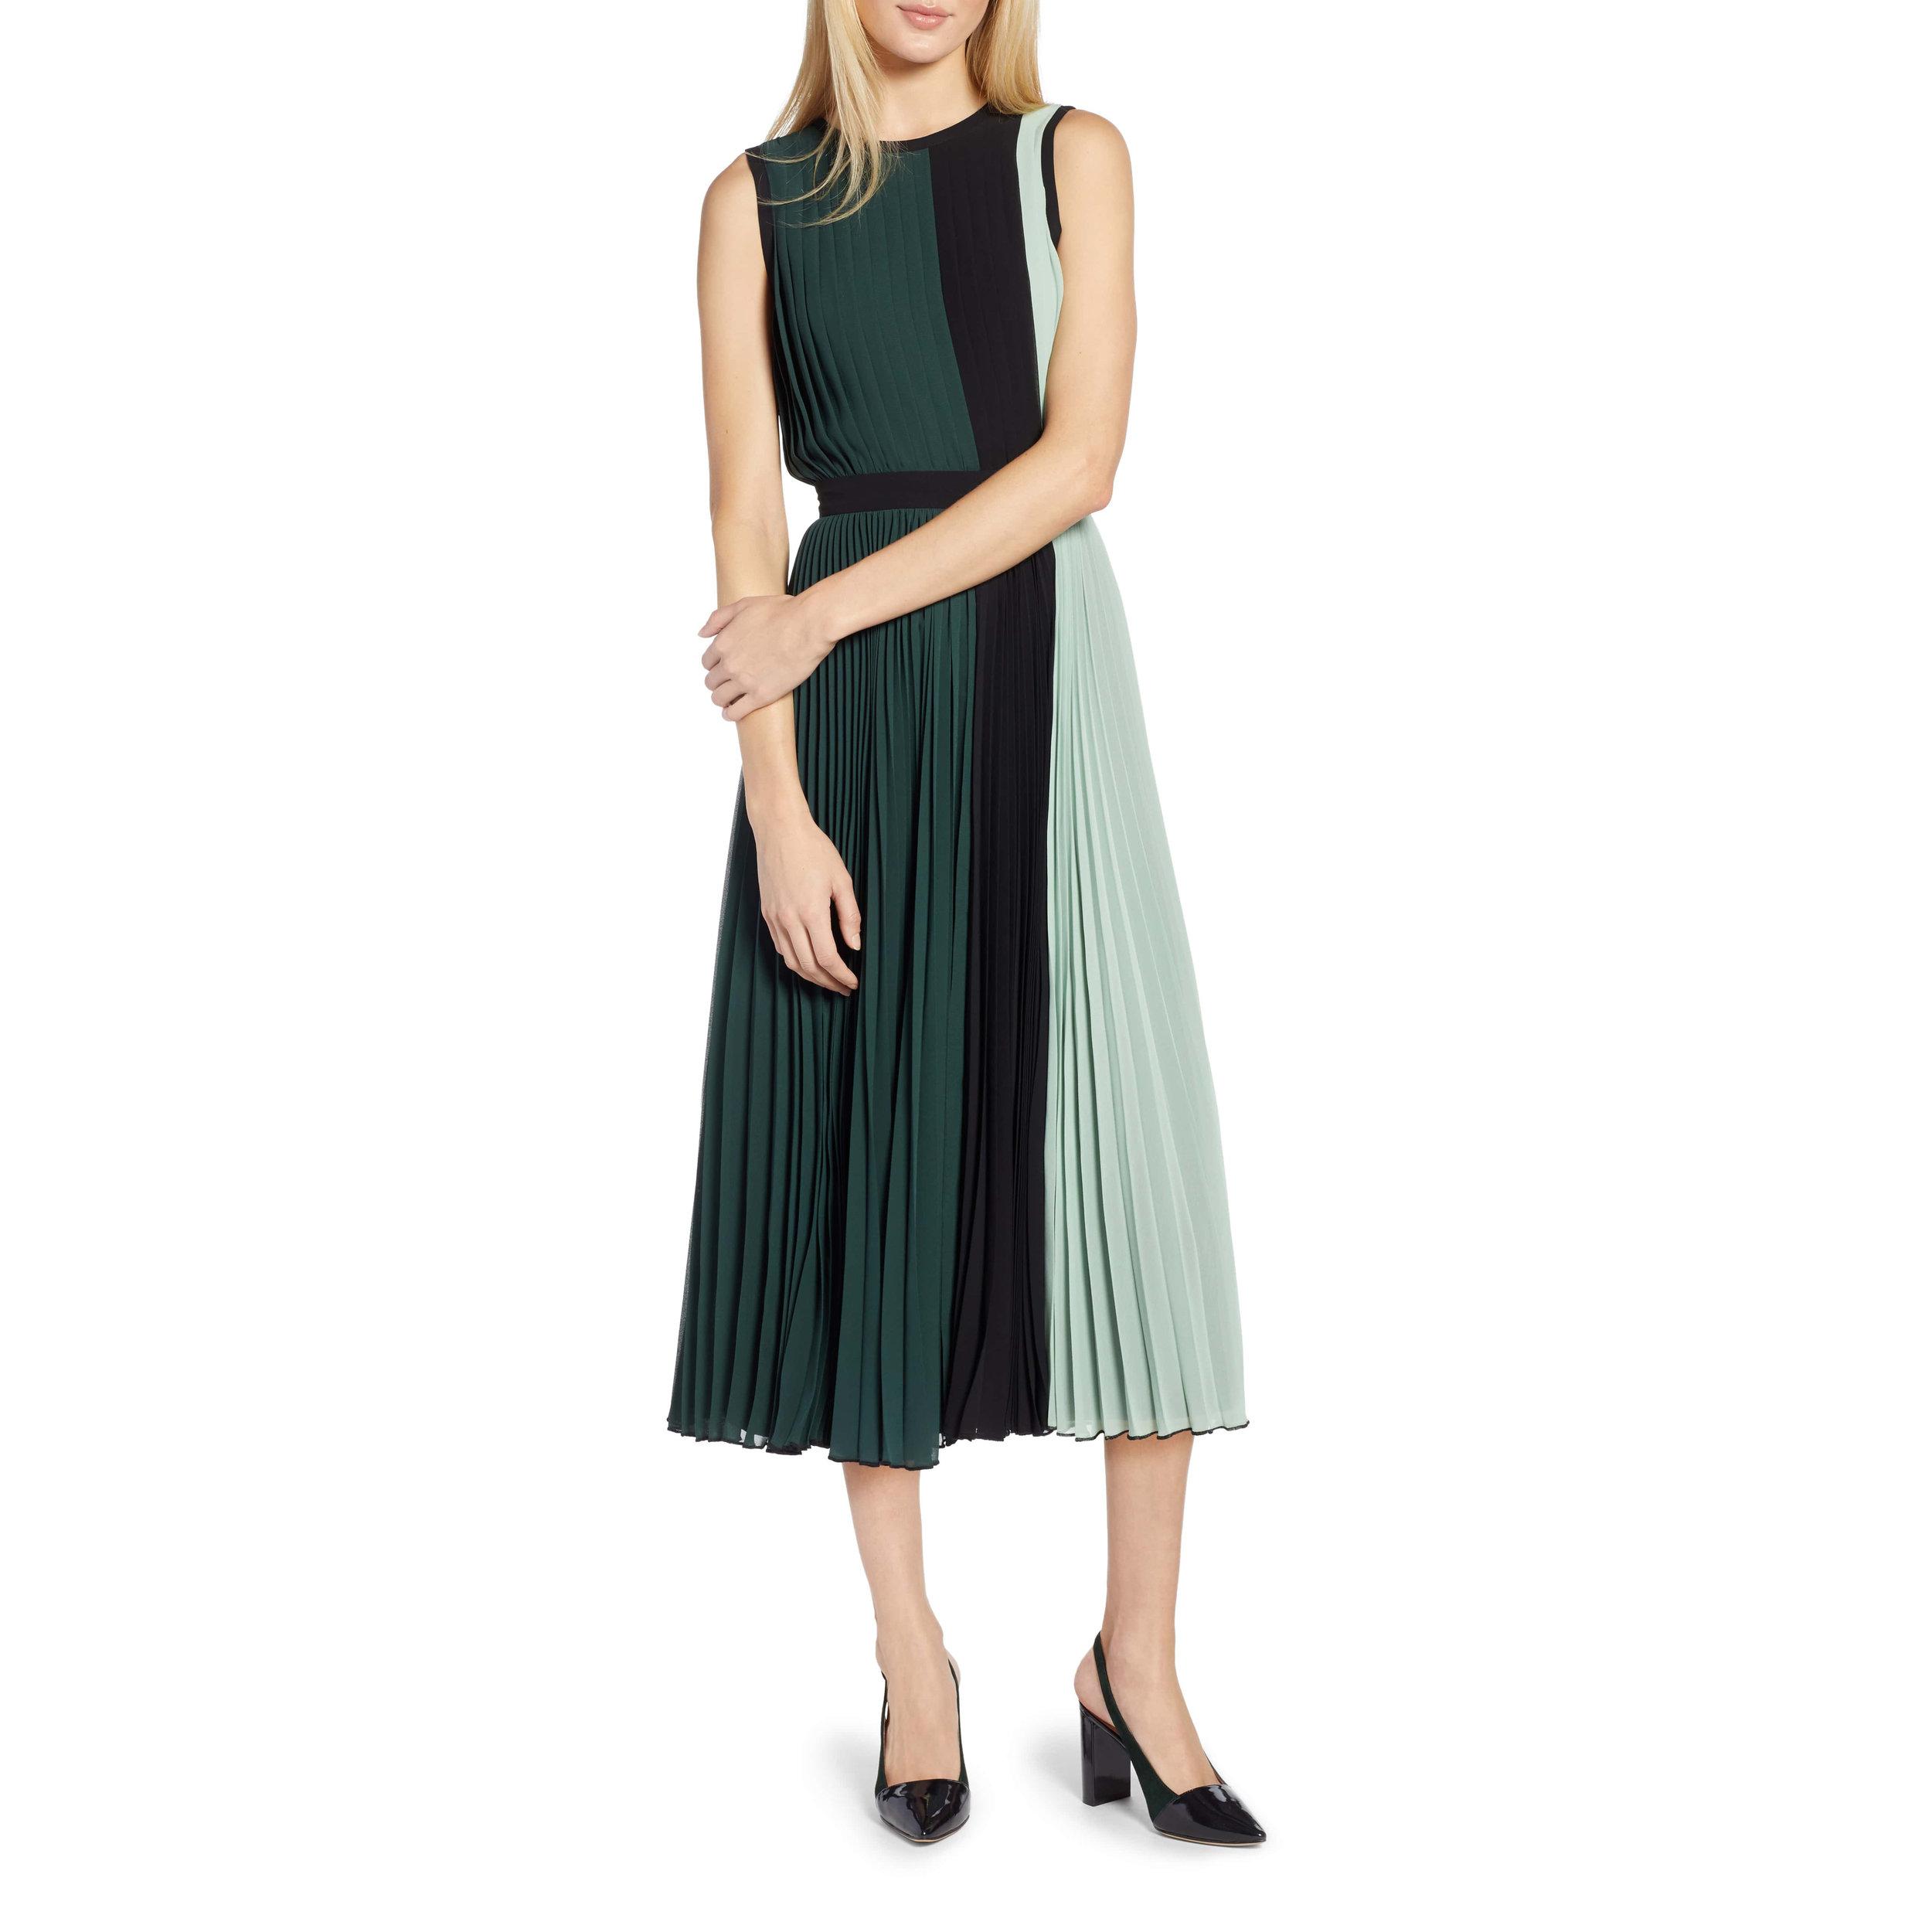 Halogen x Atlantic-Pacific Colorblock Pleated Midi Dress, Nordstrom, $149 -